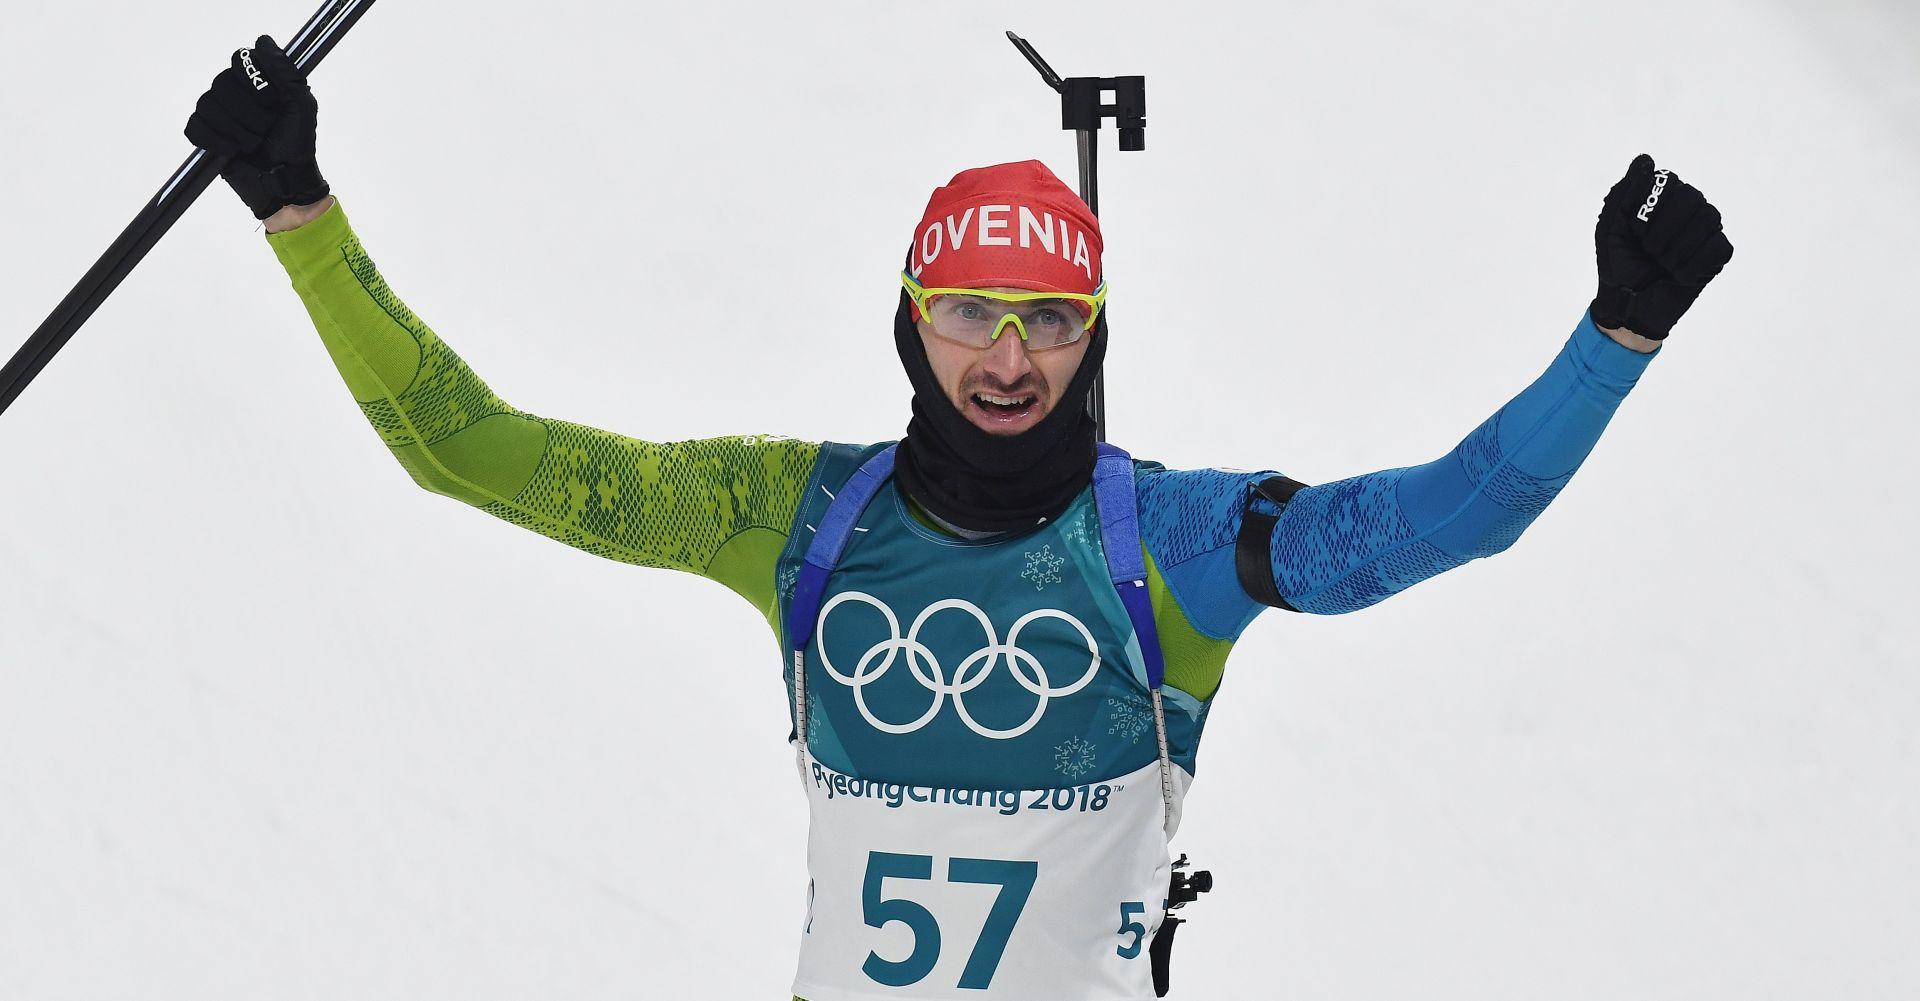 ZOI Jakov Fak Sloveniji donio srebro